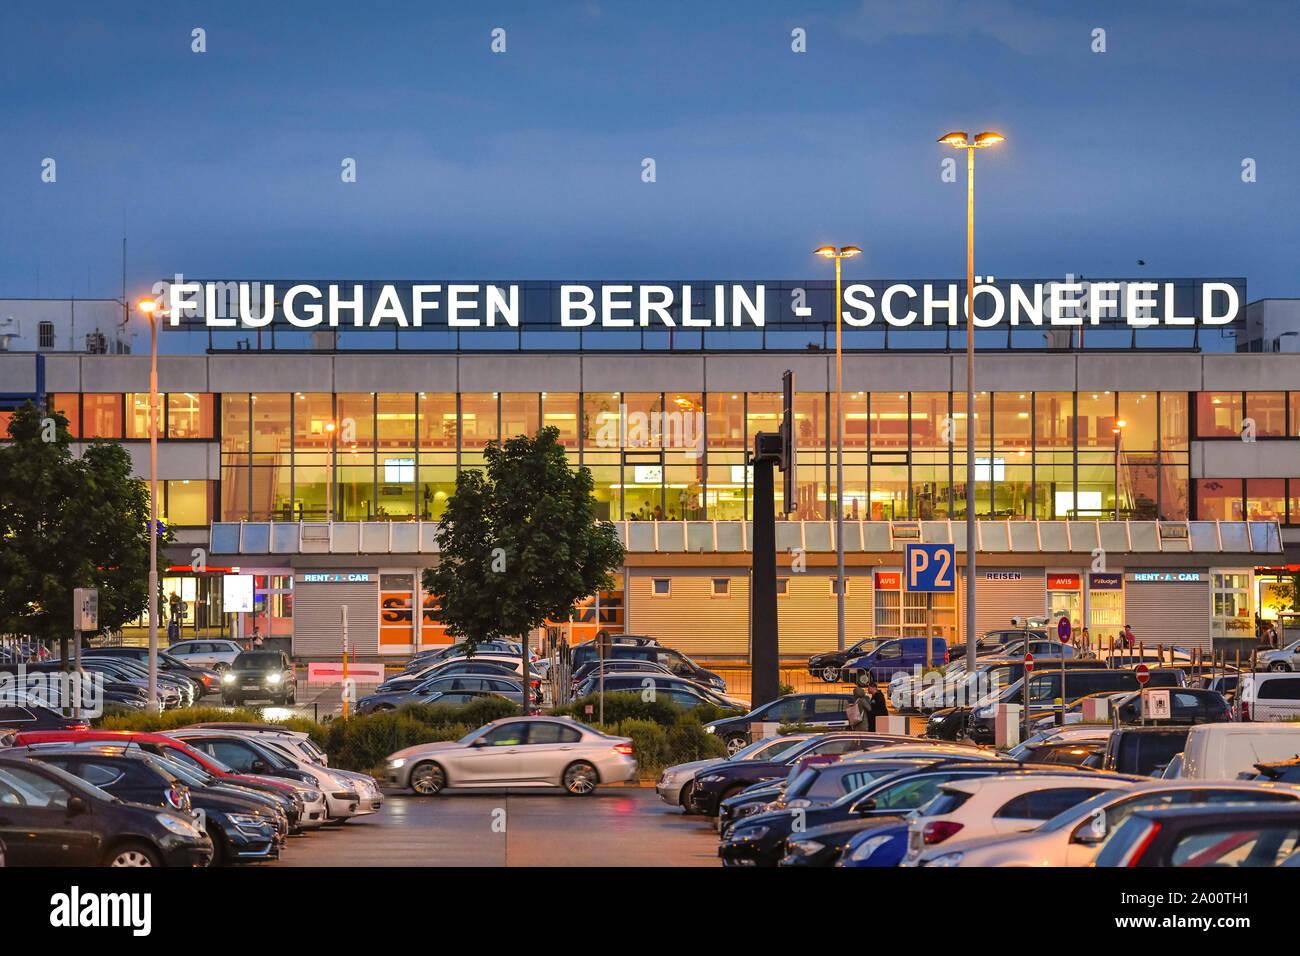 La borne A, Flughafen Schönefeld, Brandebourg, Allemagne Banque D'Images